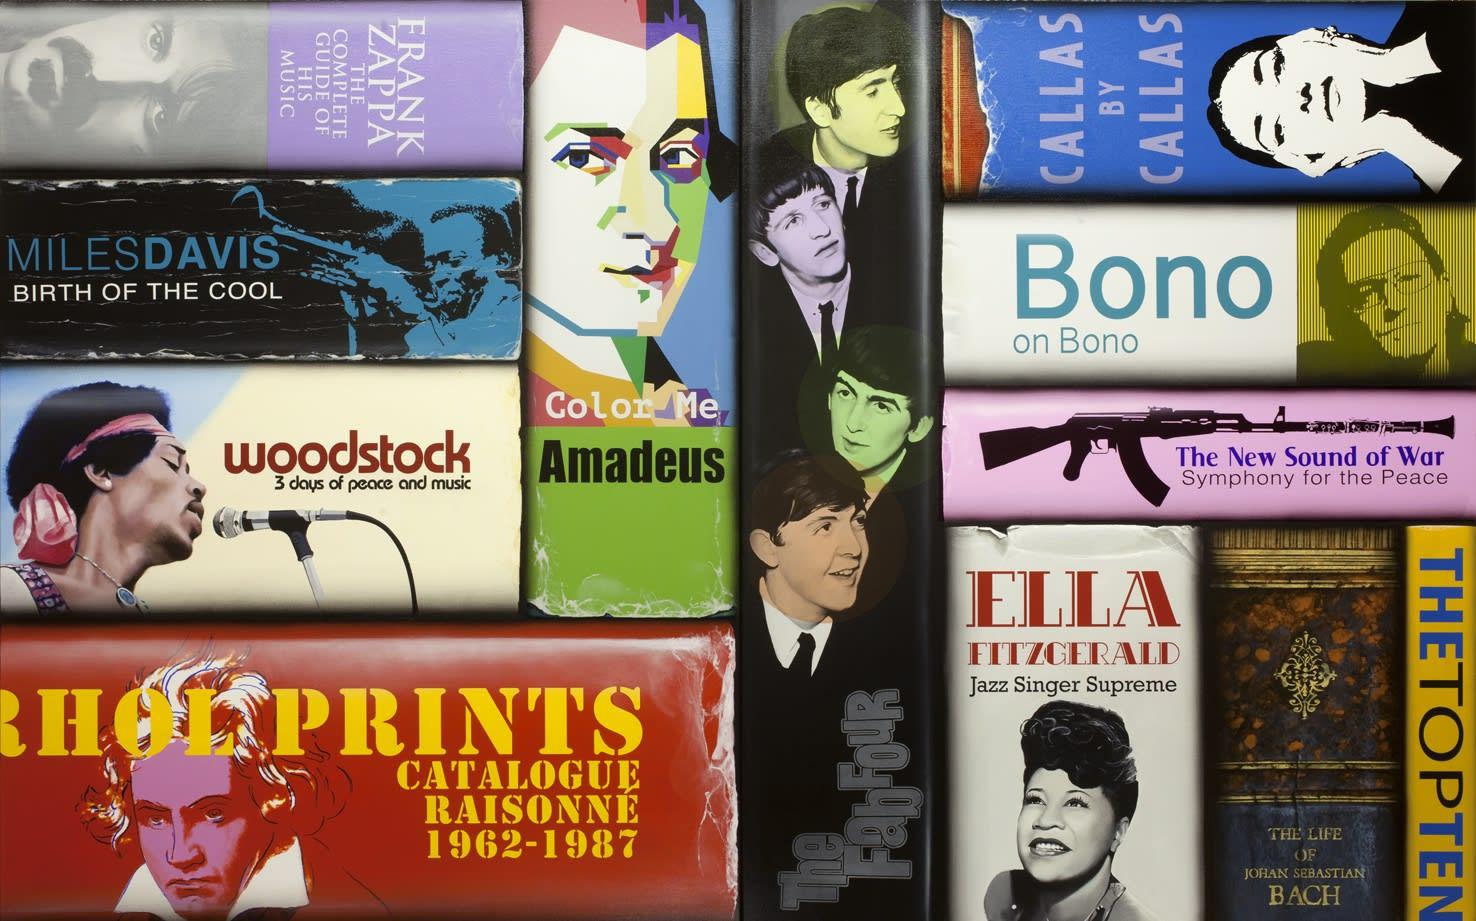 Vanitas 15.09.28 History of Music